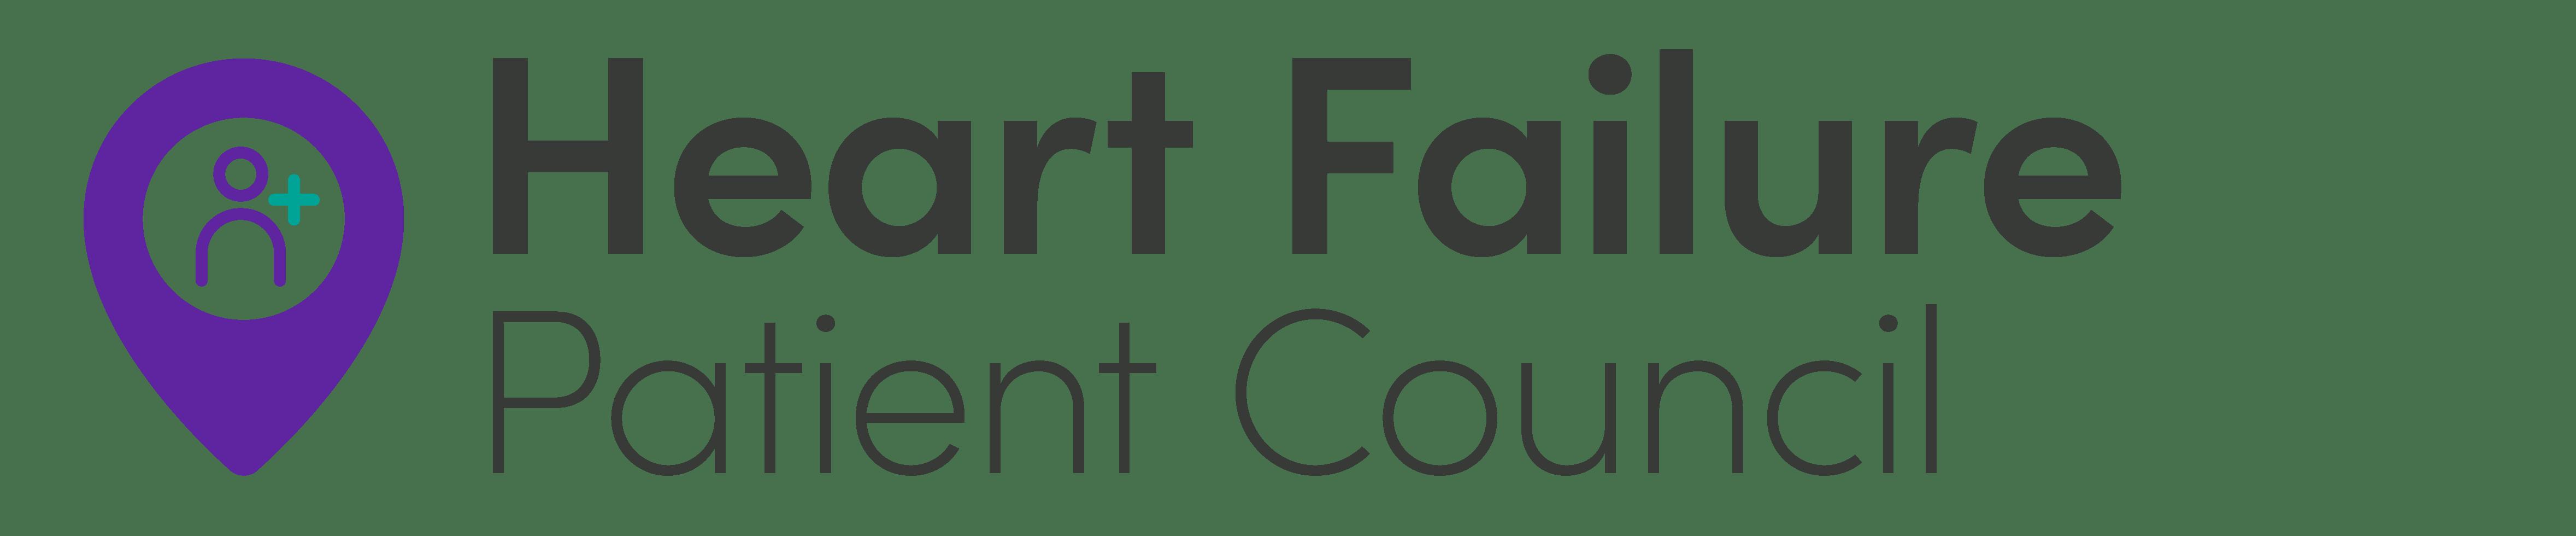 Global Heart Hub Heart Failure Patient Council